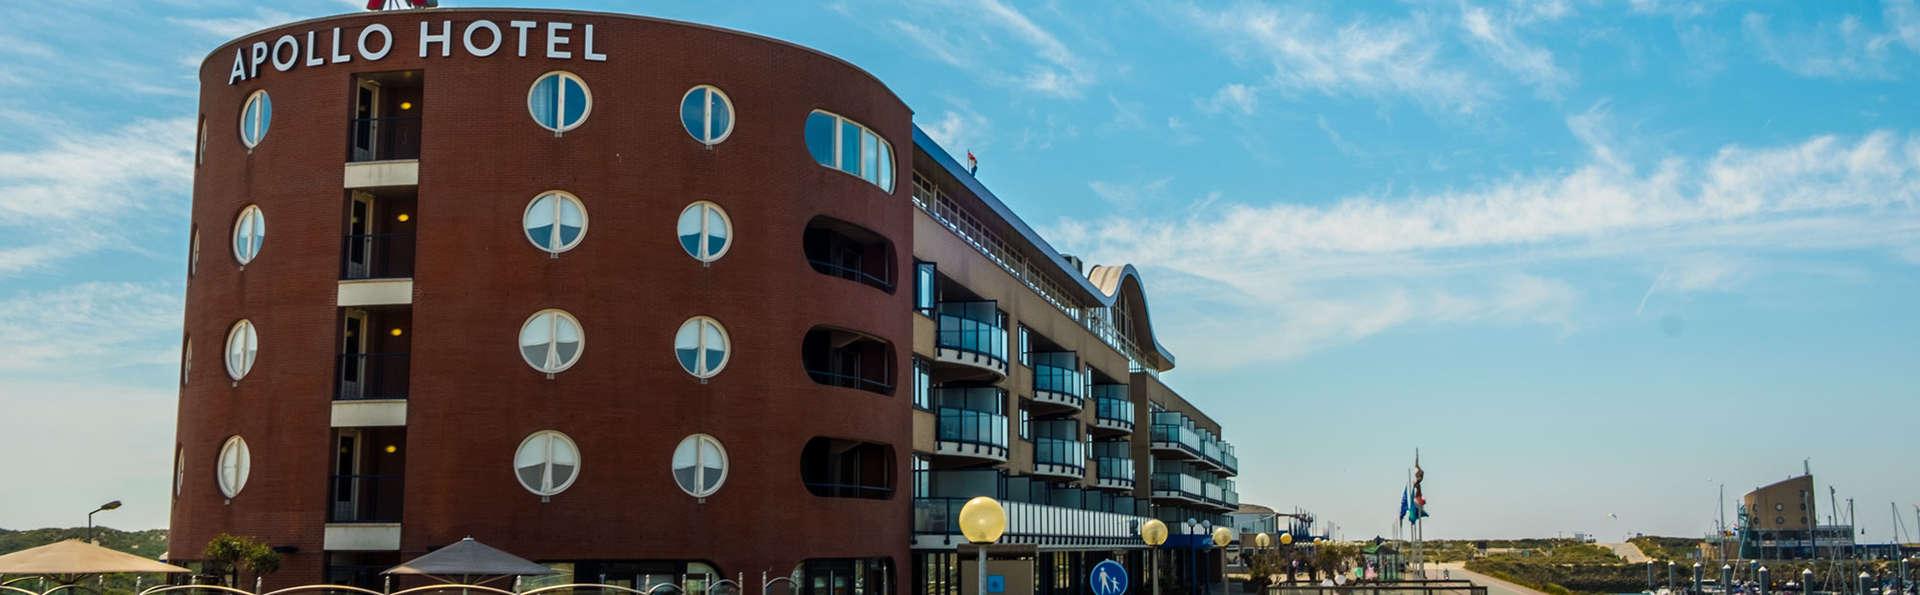 Apollo Hotel IJmuiden Seaport Beach - Edit_Frotn2.jpg